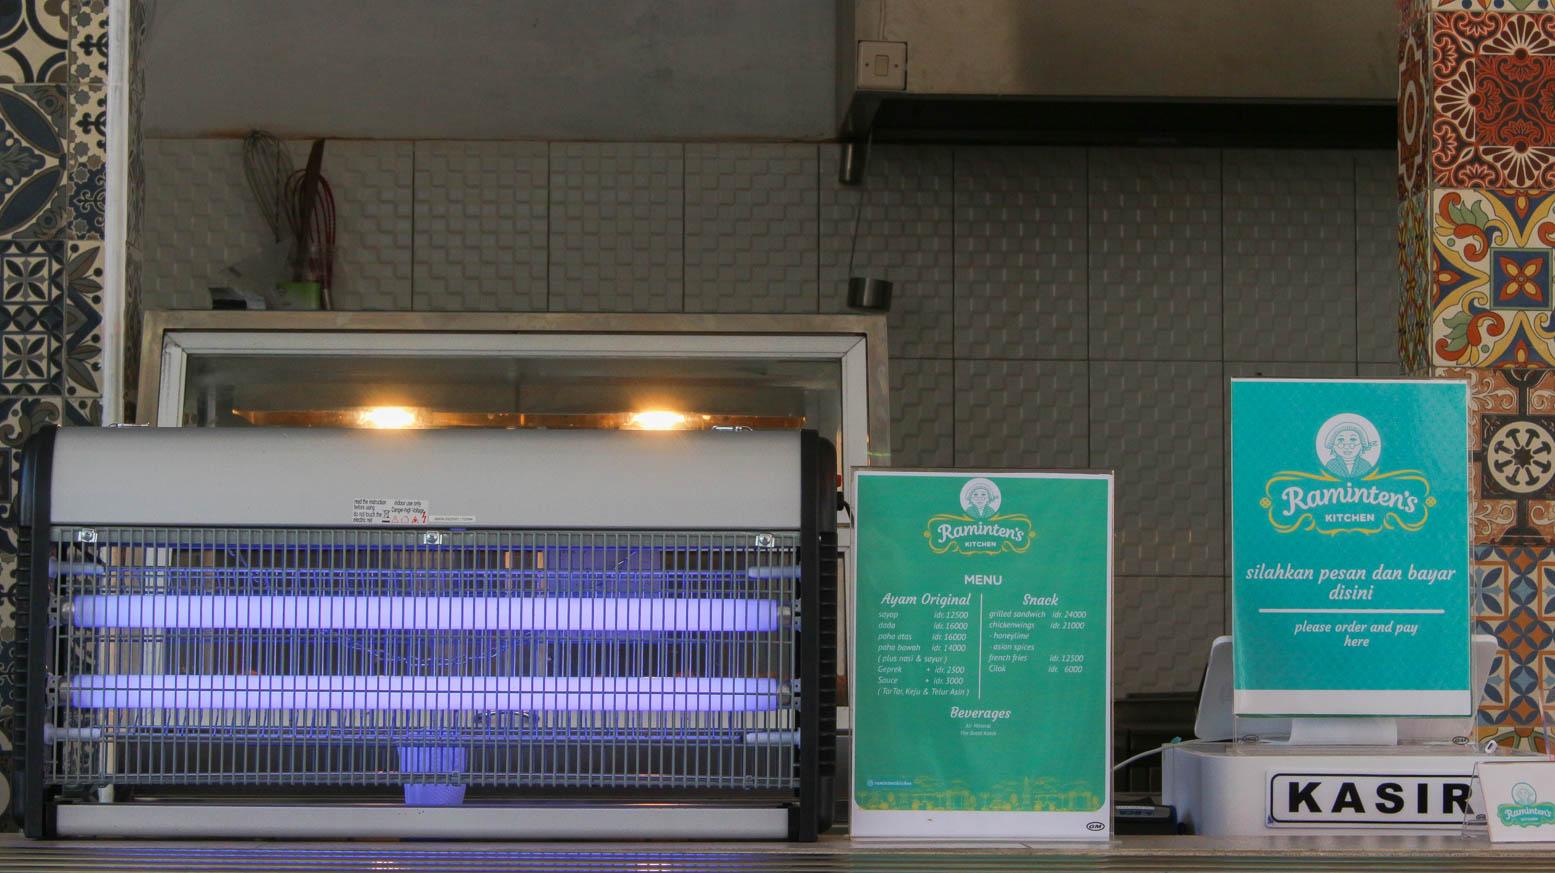 Raminten kitchen yogyakarta keliatan nggak menu sama harganya itu